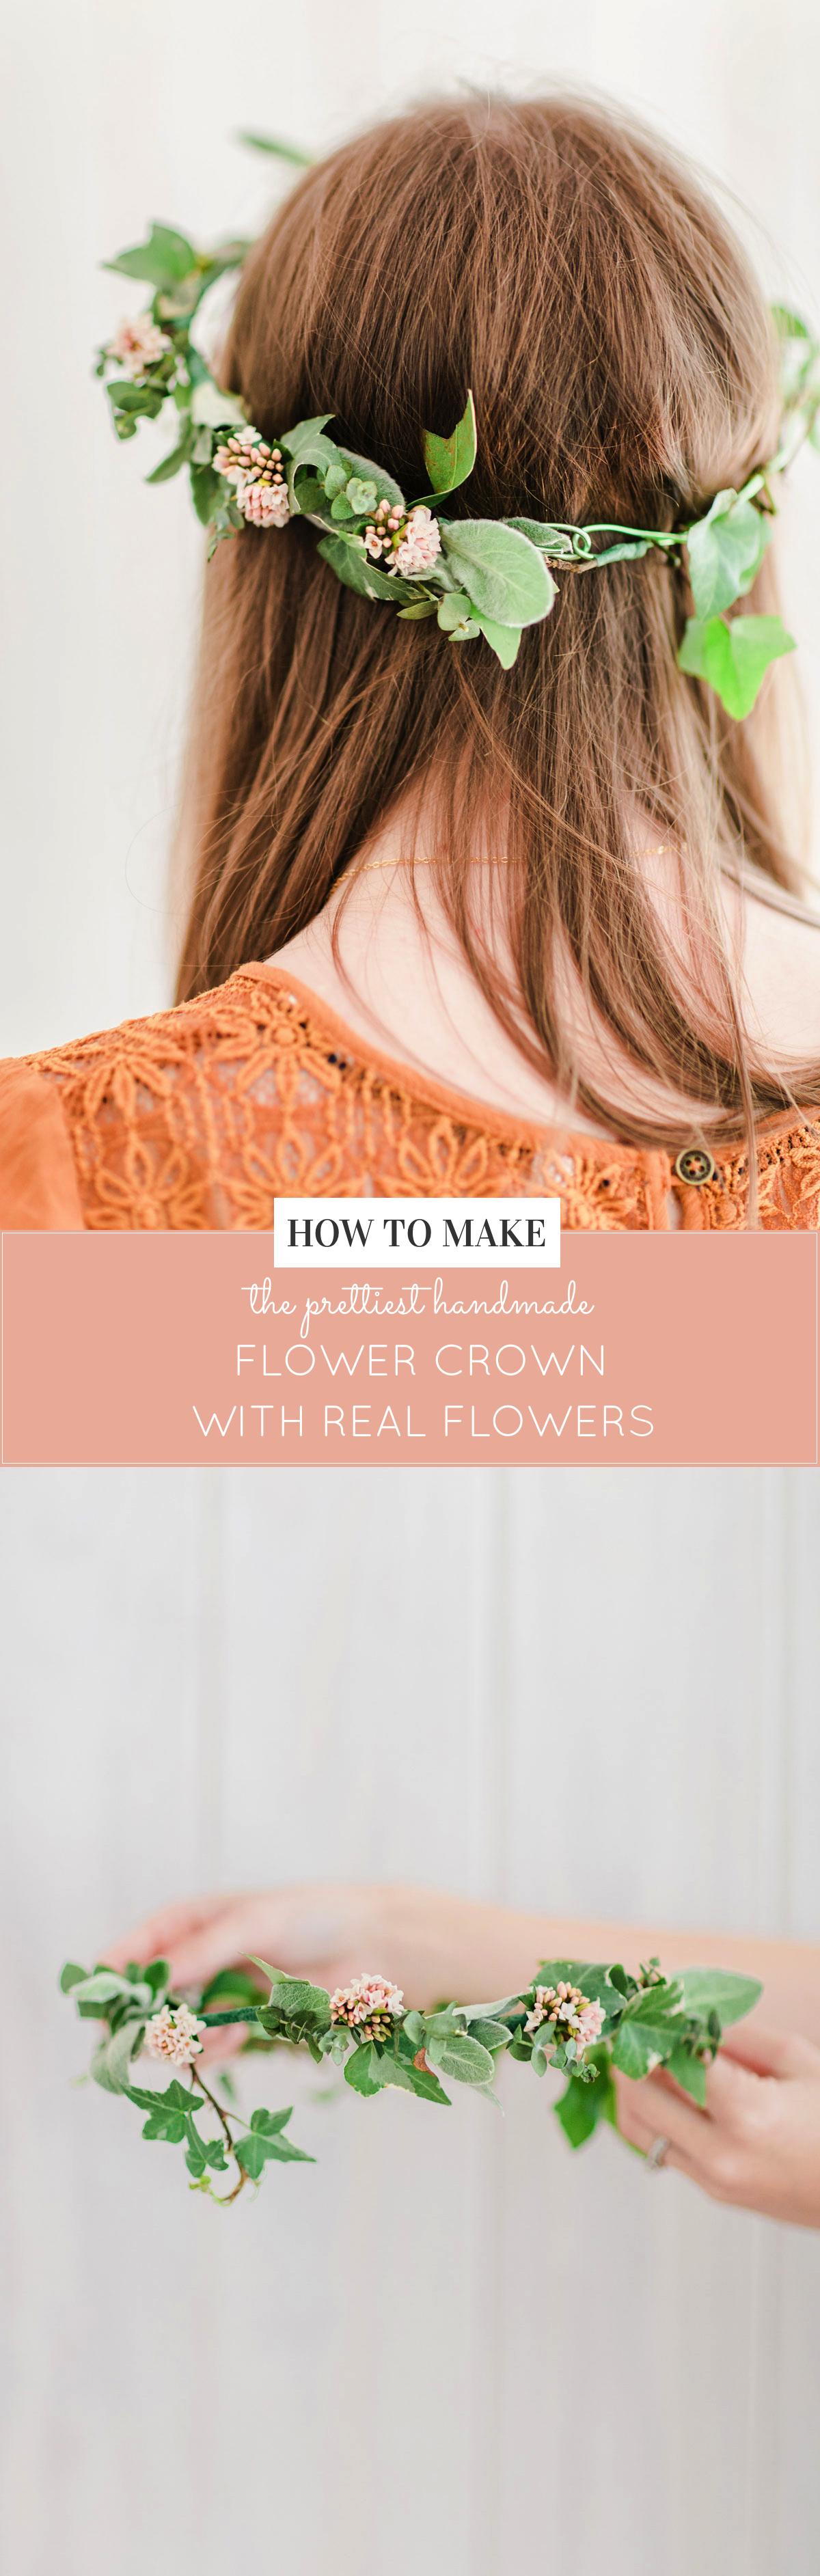 How to Make a Real Flower Crown | DIY flower crown | flower crown tutorial | easy flower crown tutorial | DIY beauty ideas || Glitter, Inc.